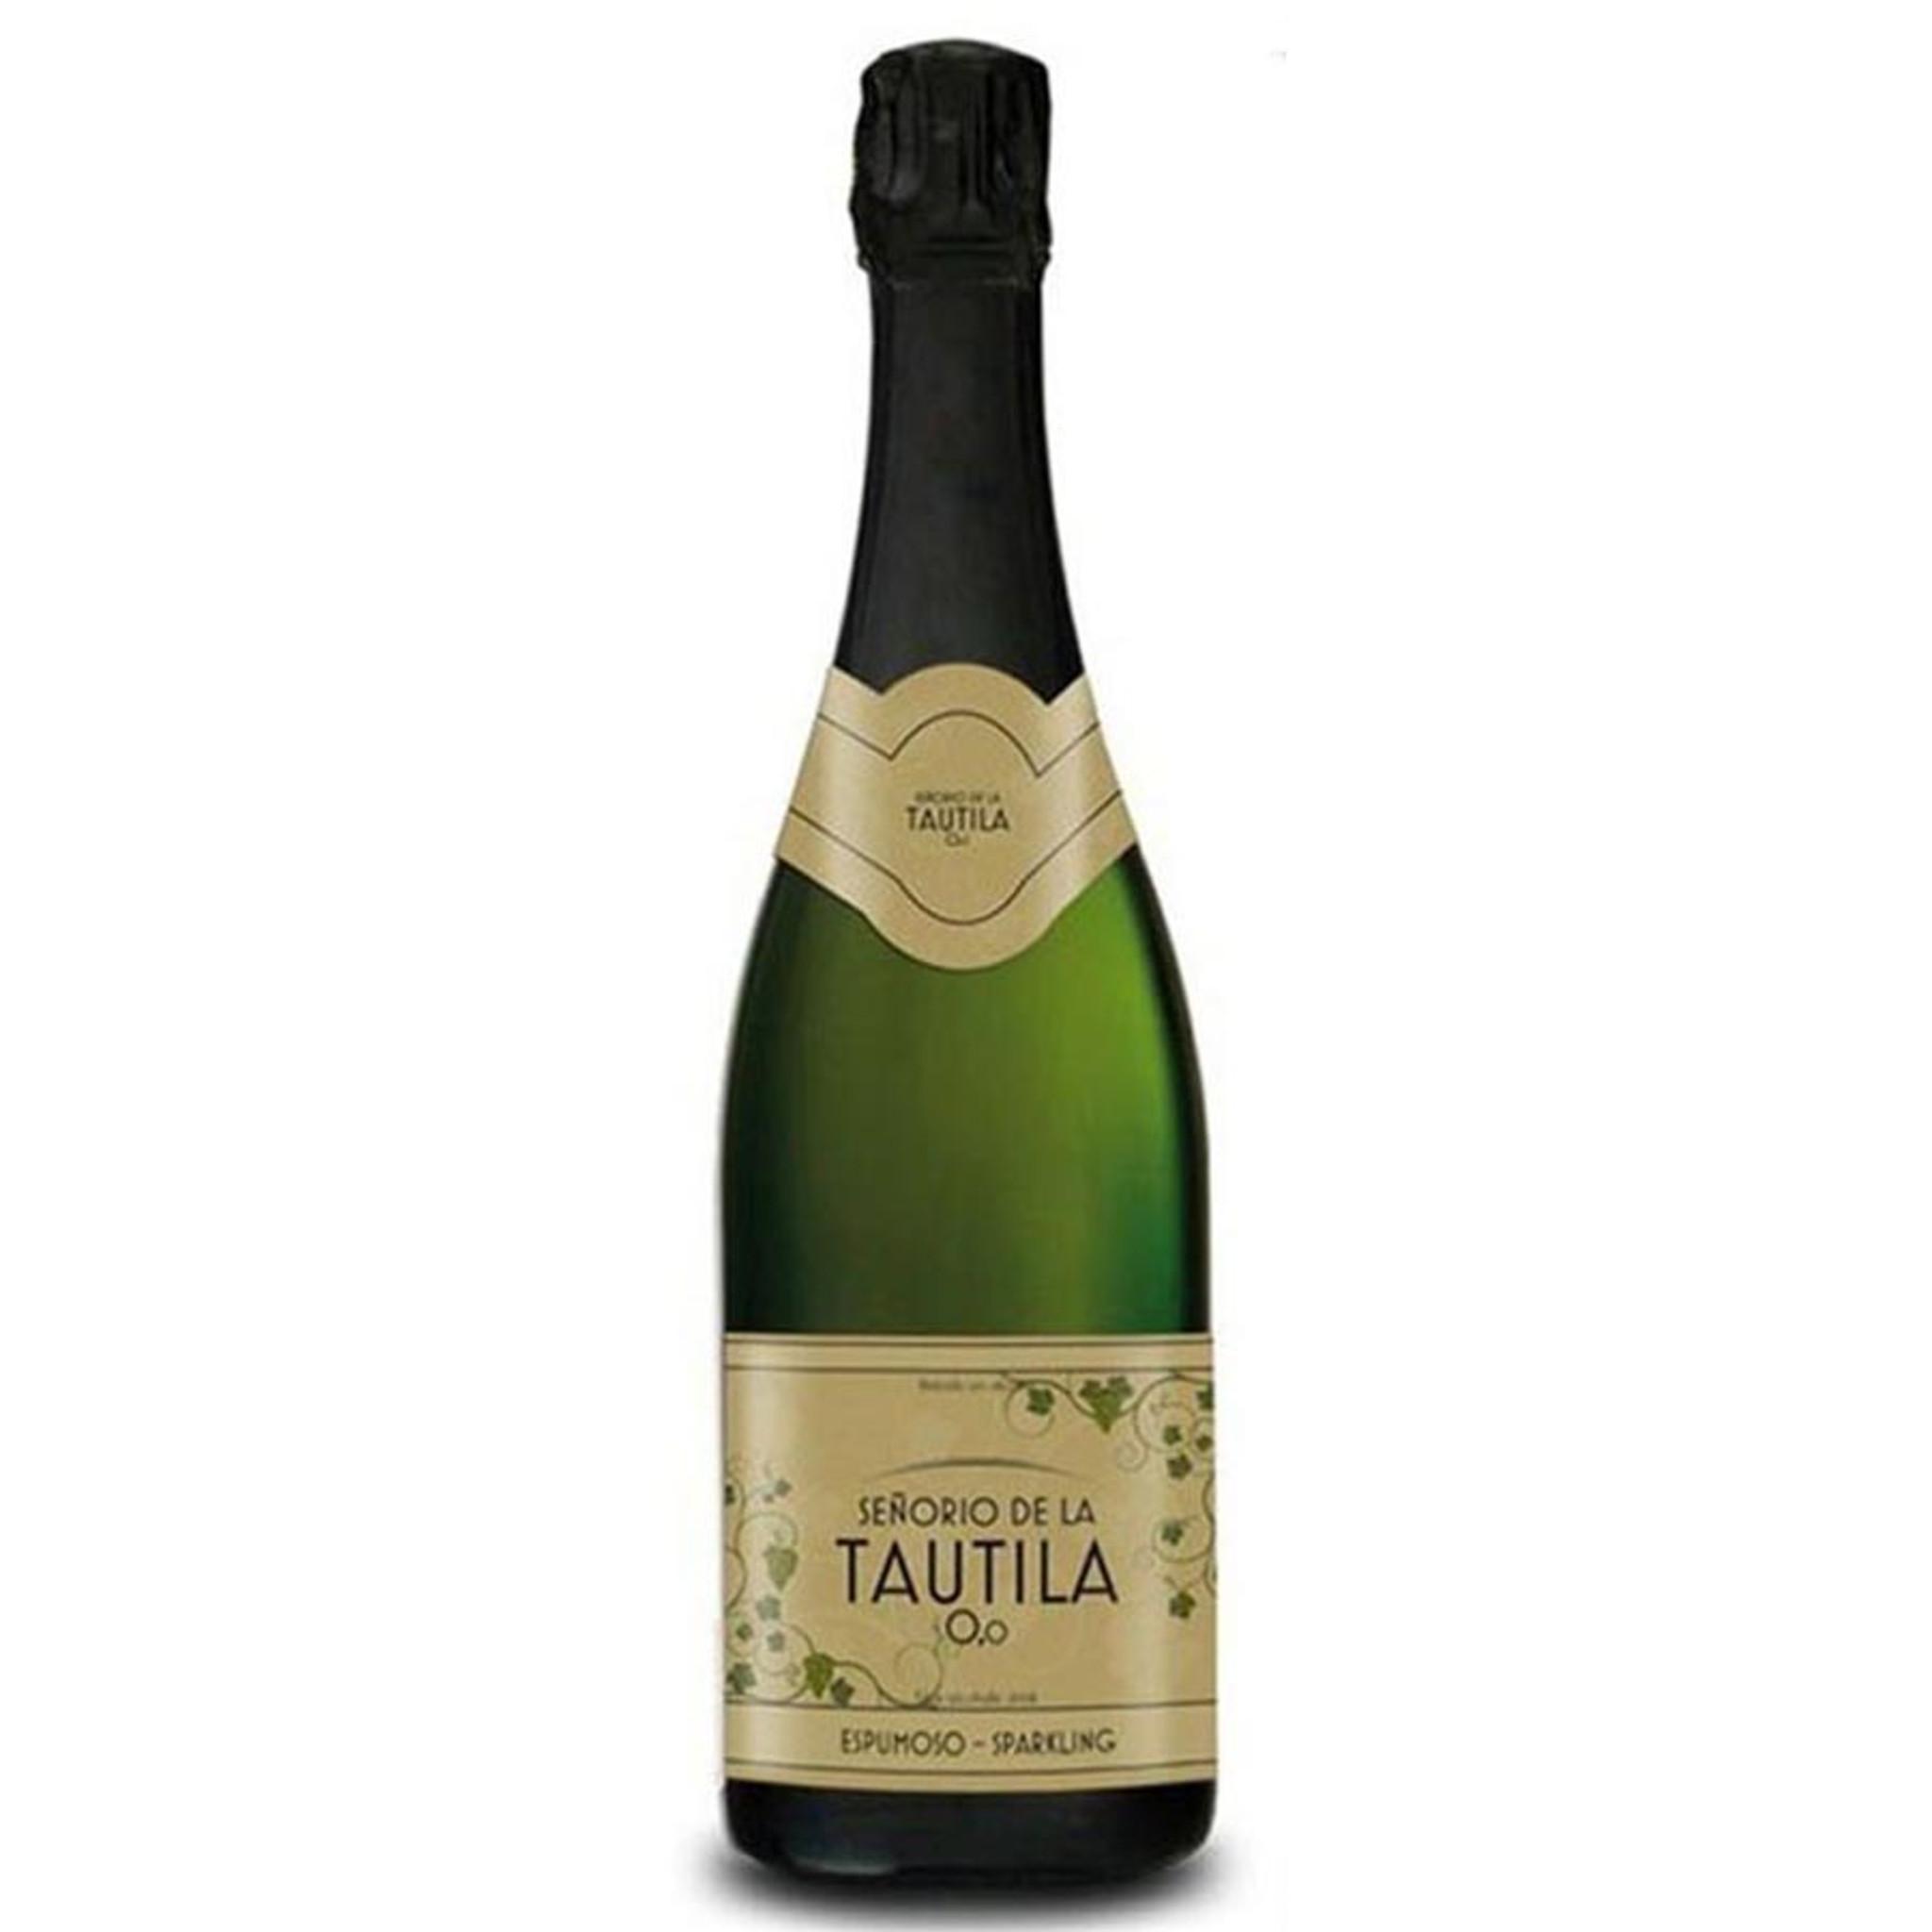 Senorio de la Tautila Espumoso Blanco Alcohol Free Sparkling White Wine 750ml